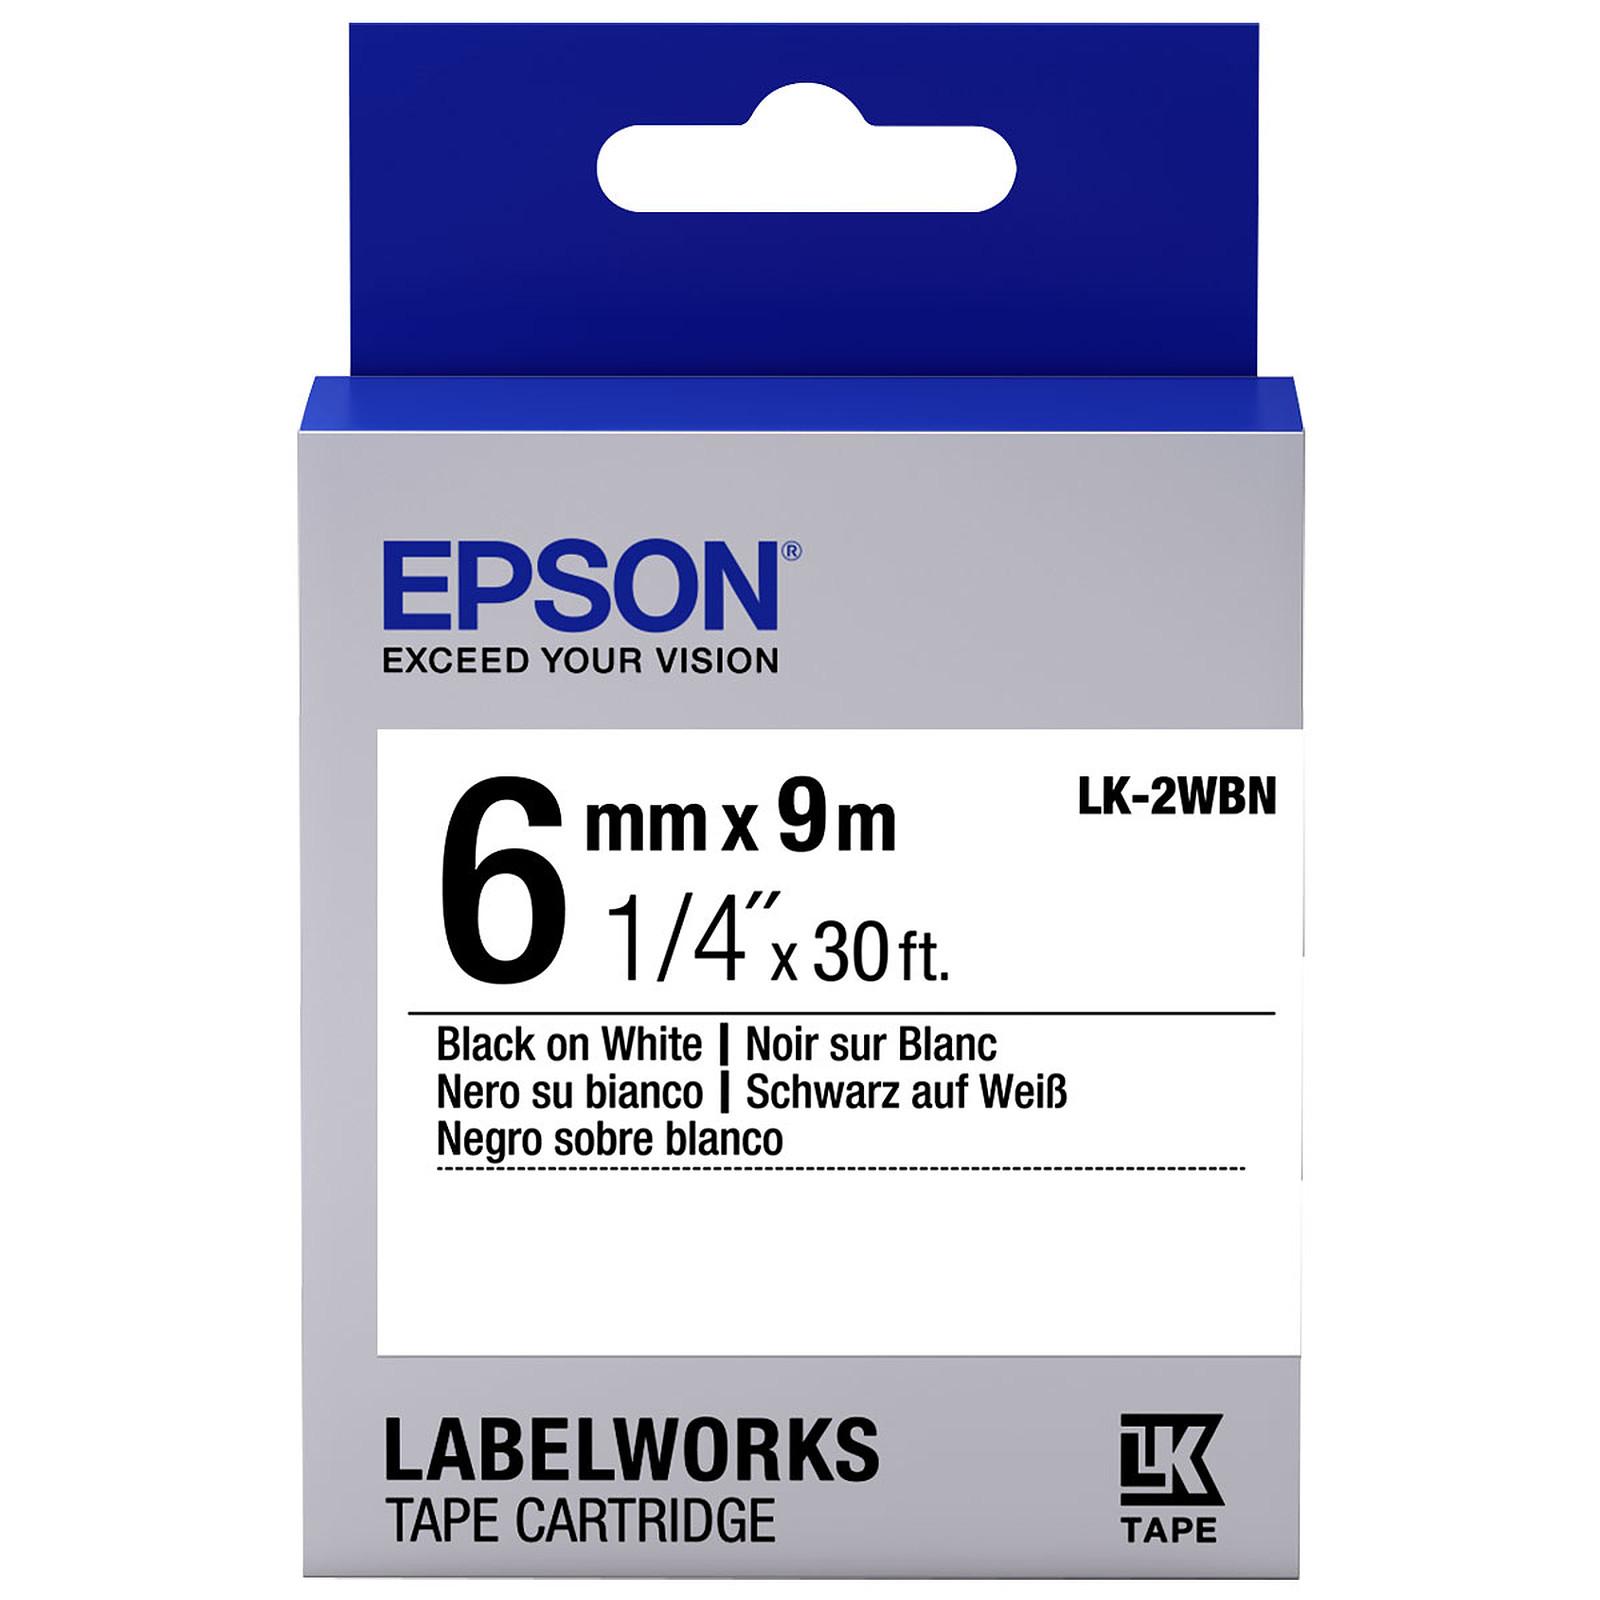 Epson LK-2WBN blanco/negro